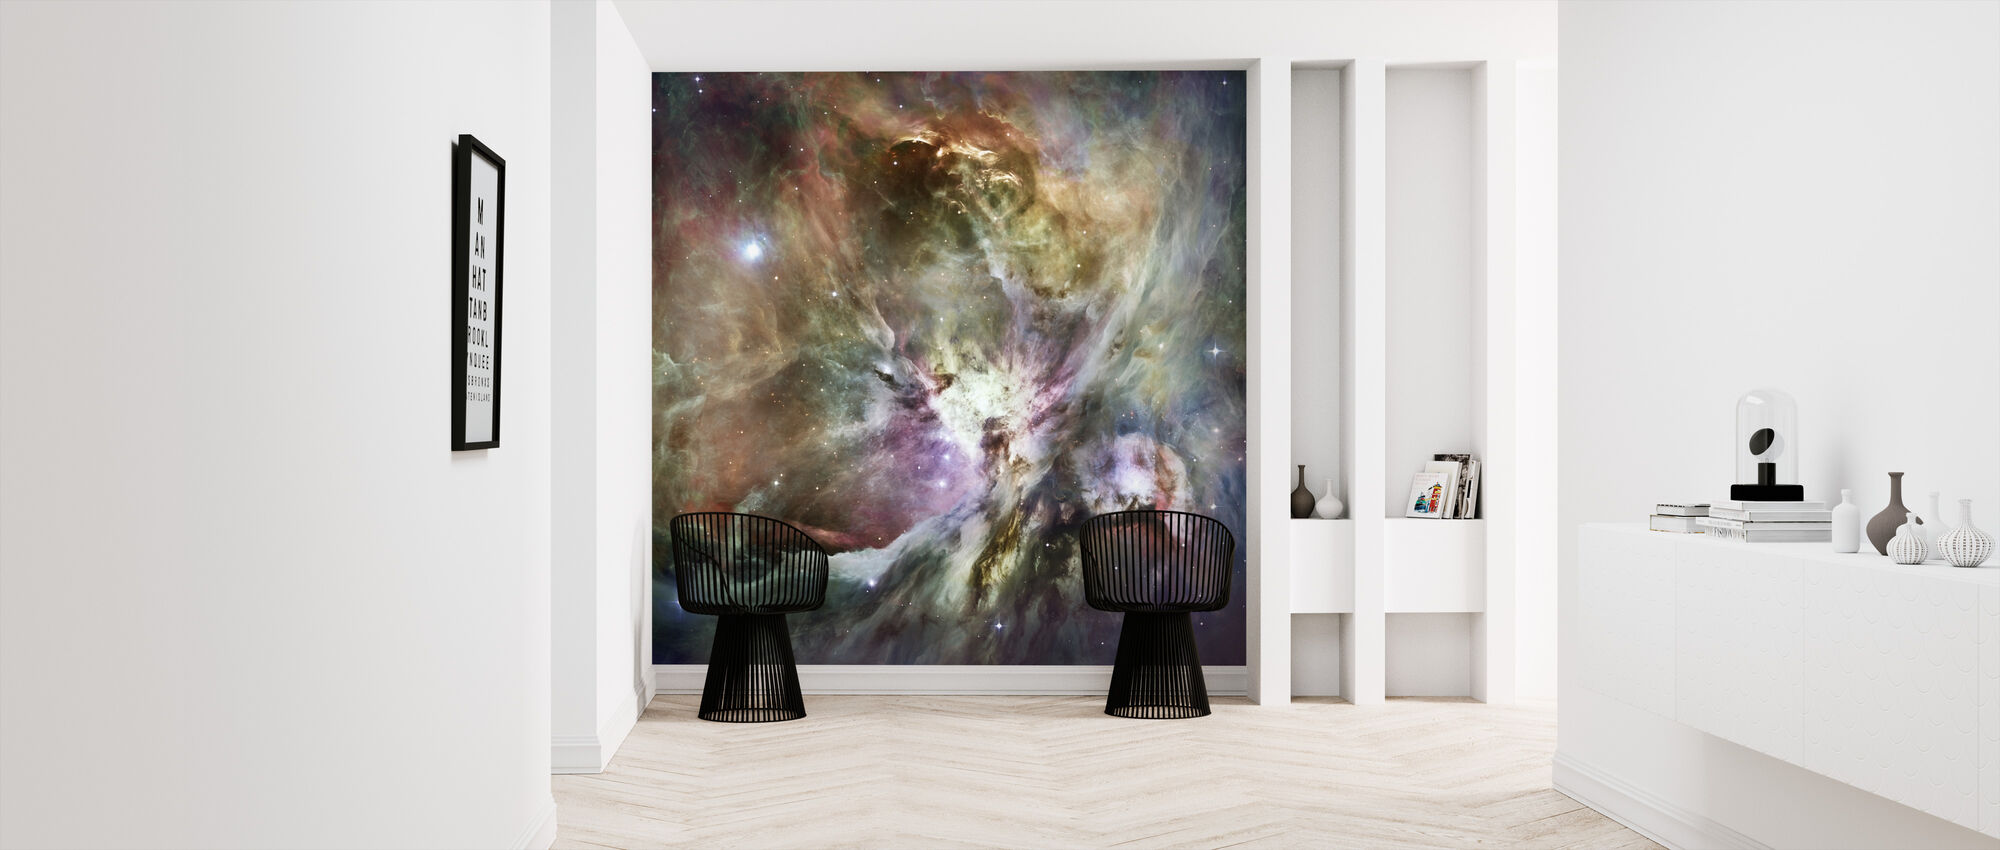 Orion Nebula - Wallpaper - Hallway